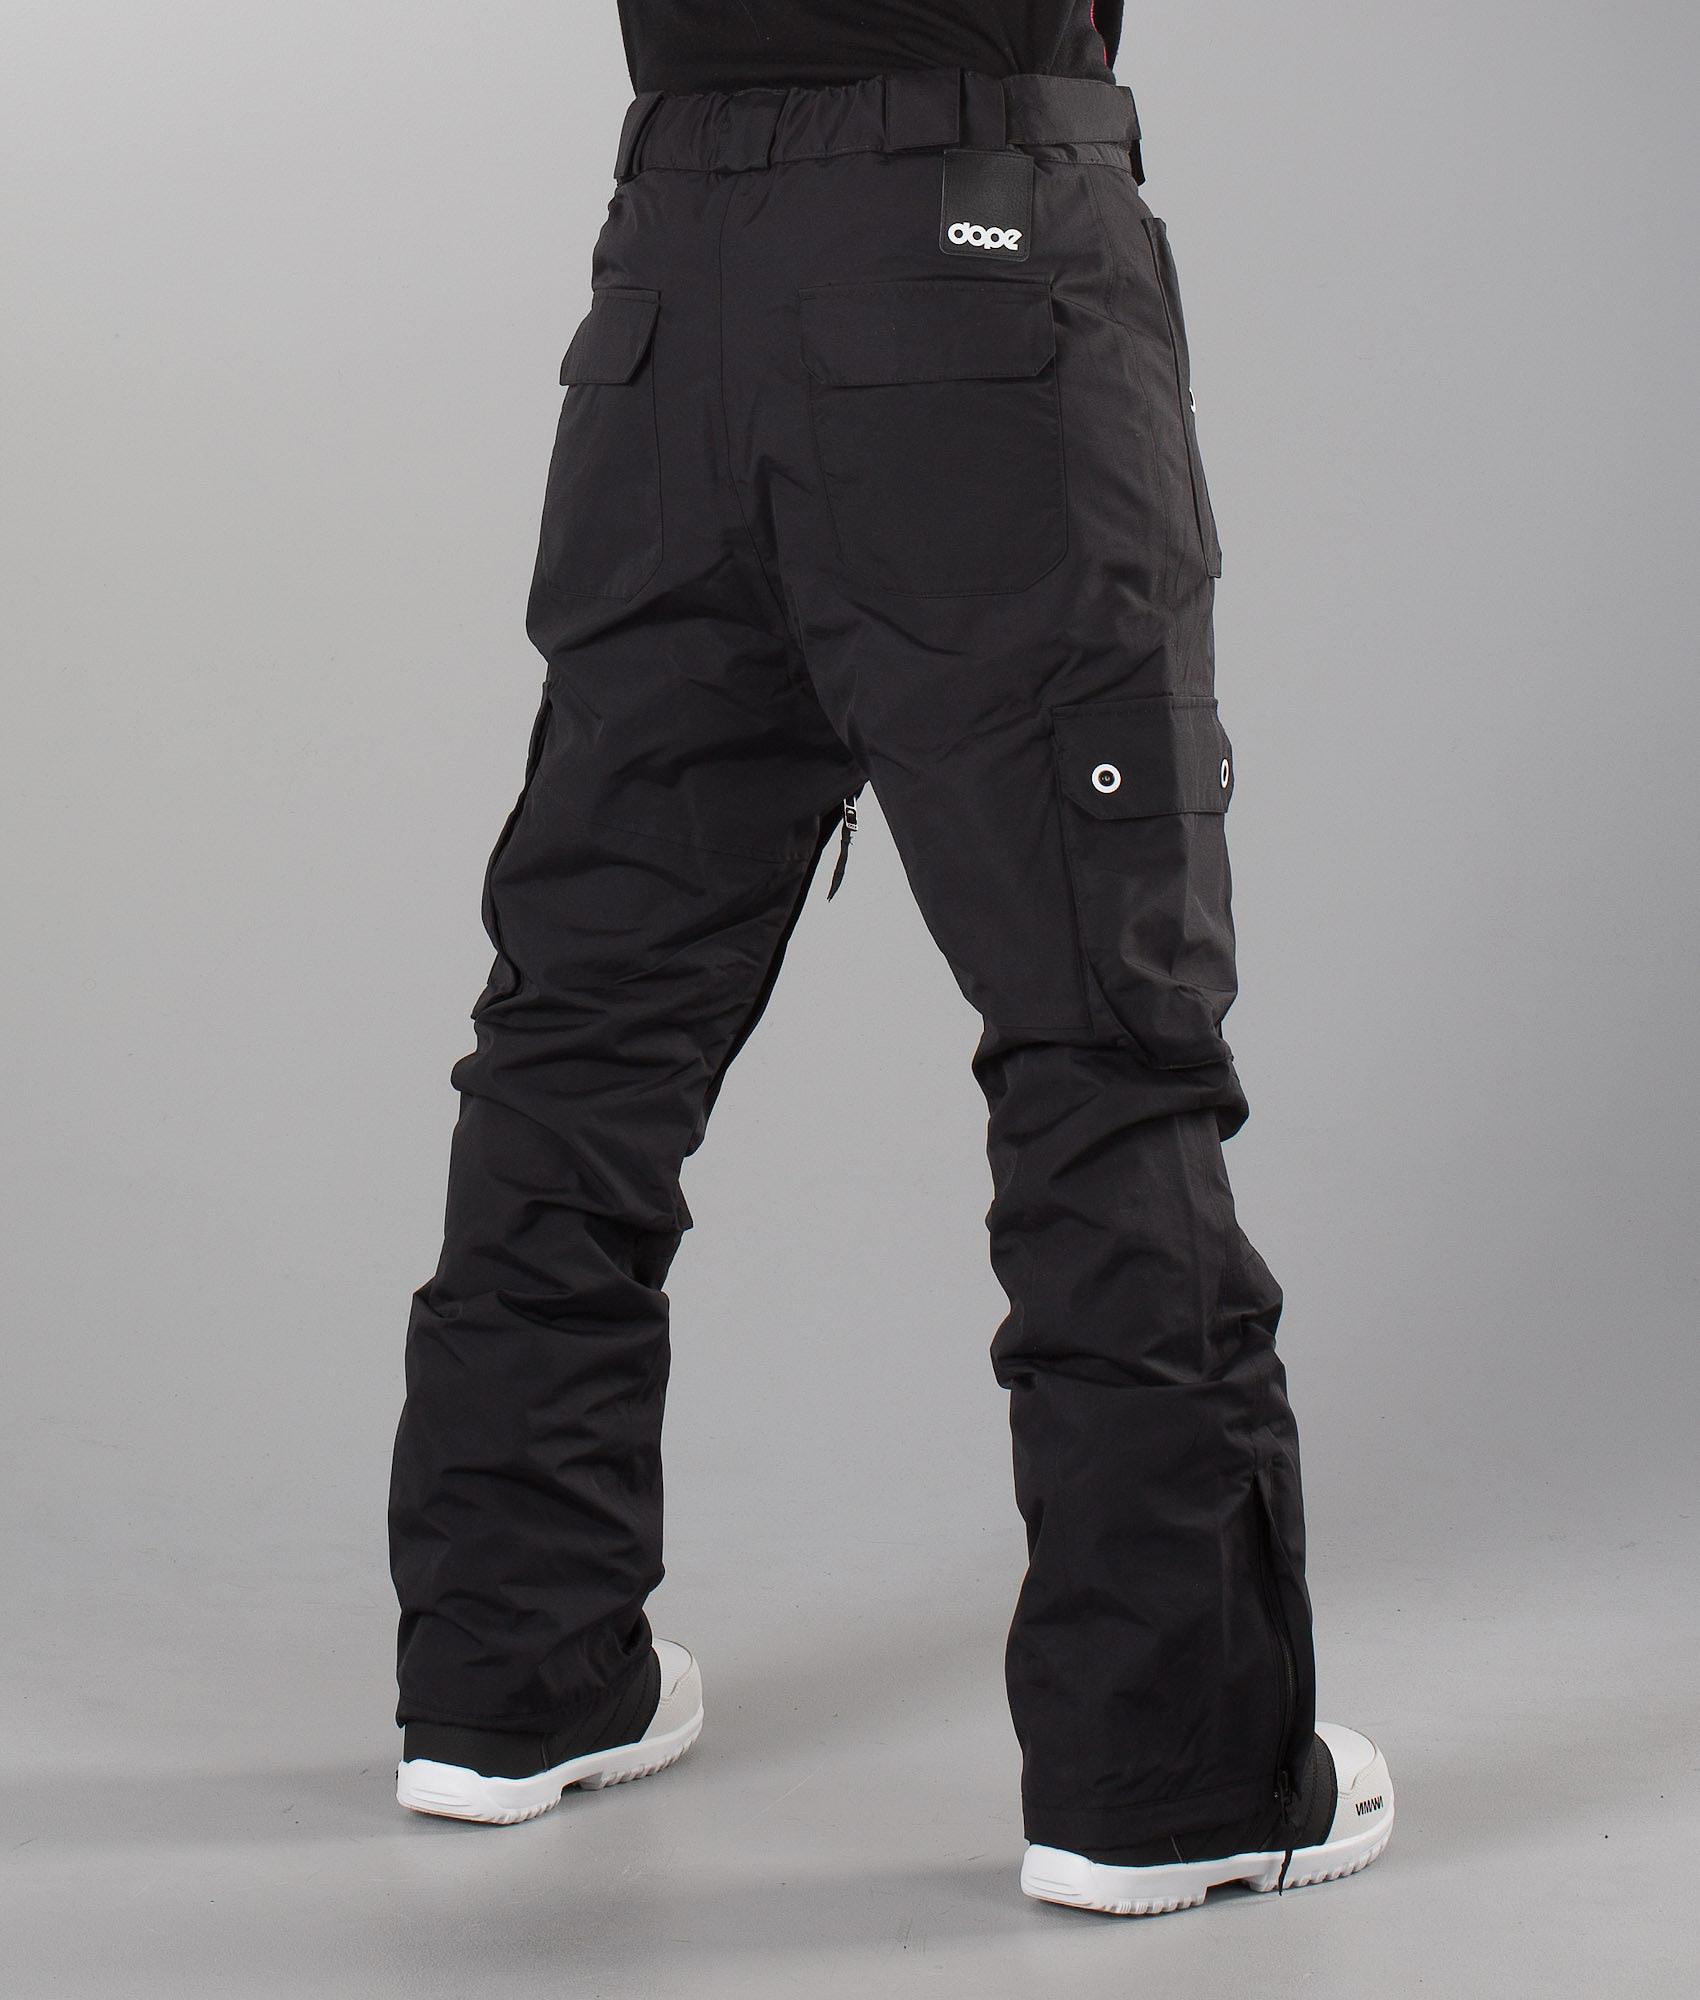 ba003ee8ef Dope Adept Unisex Snow Pants Black - Ridestore.com